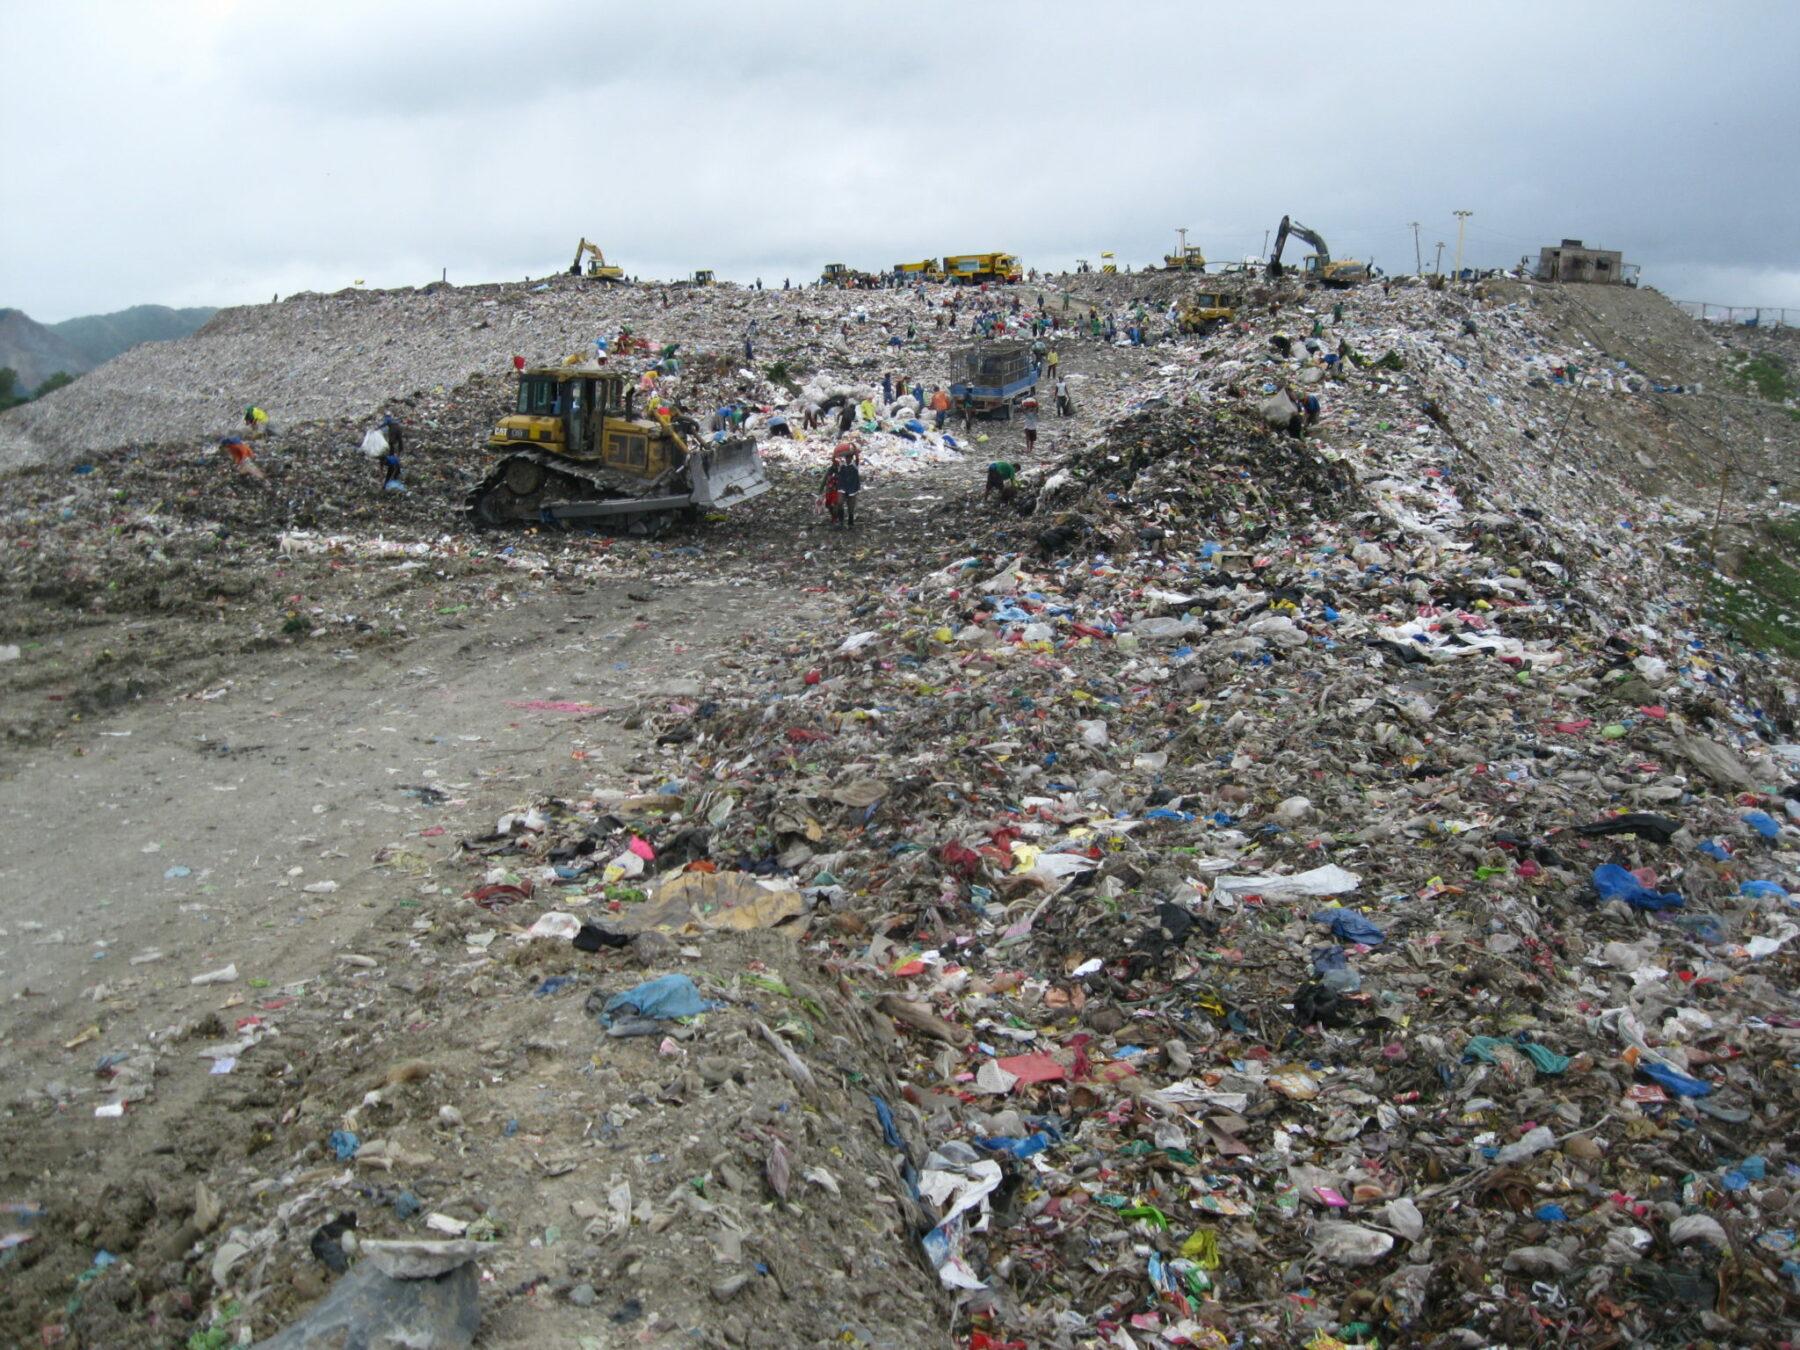 Die Müllberge von Payatas